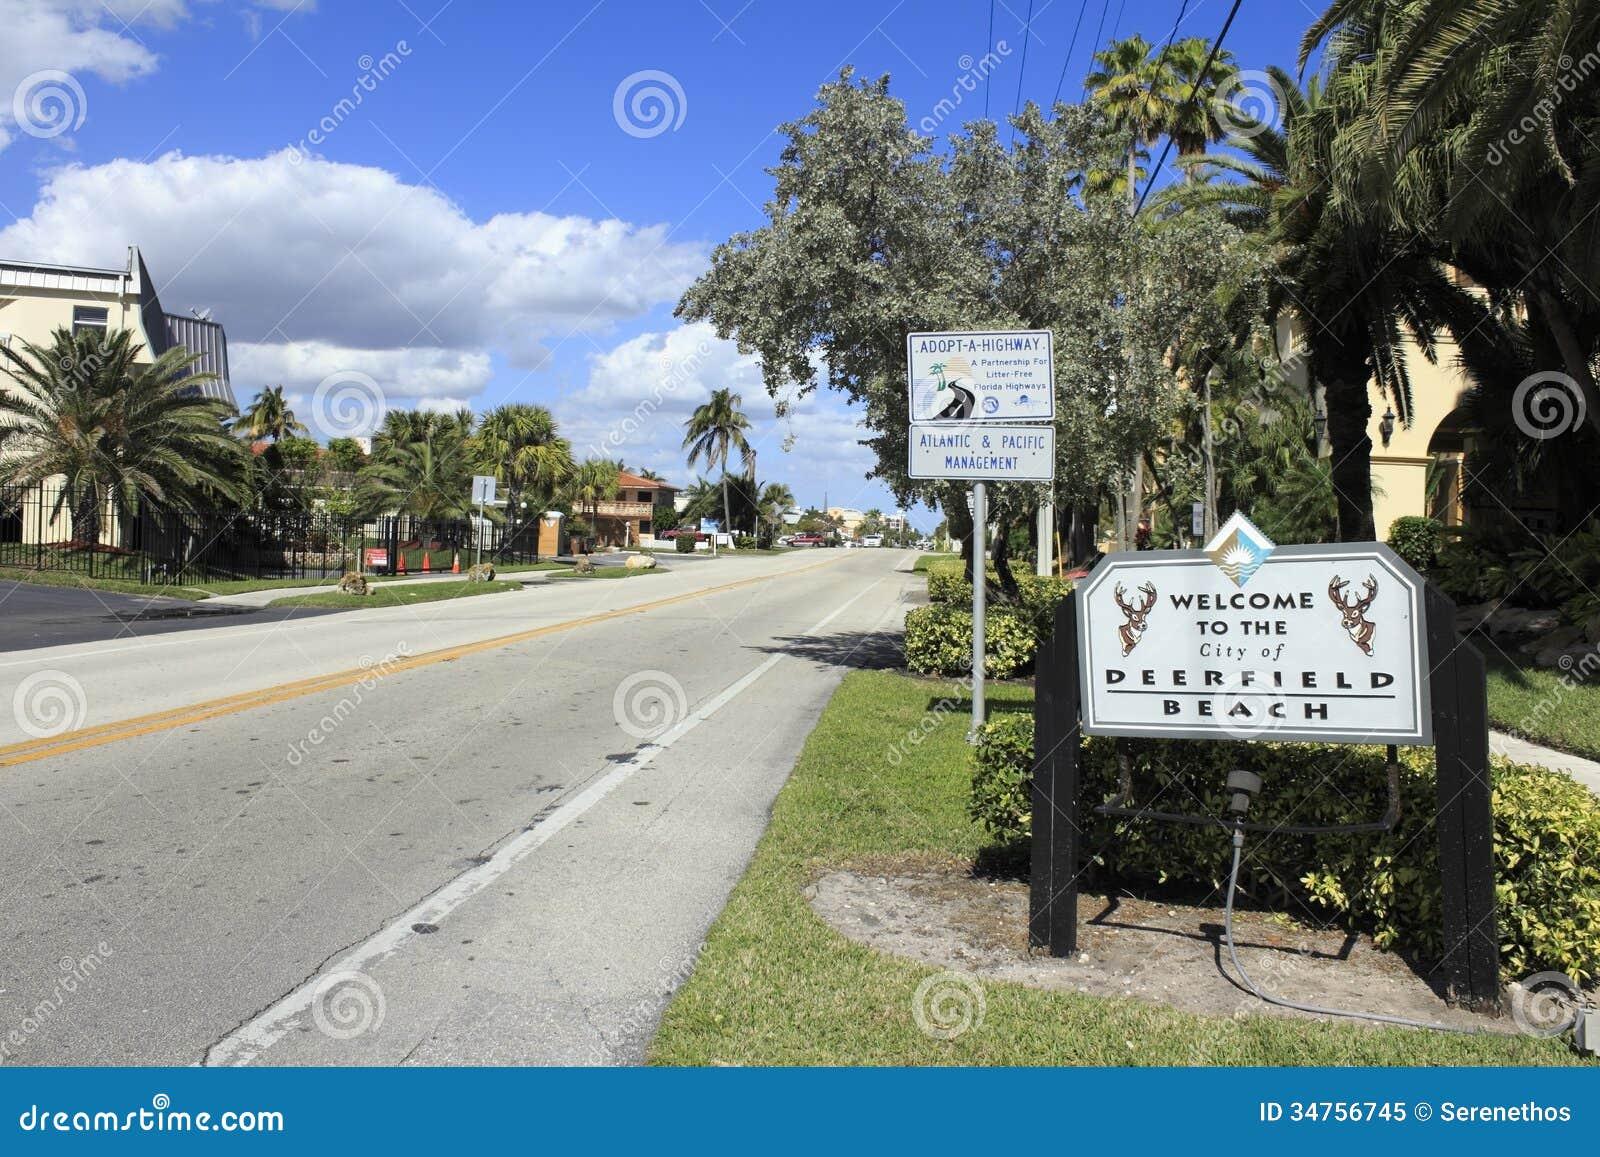 Deerfield Beach Florida Weather February